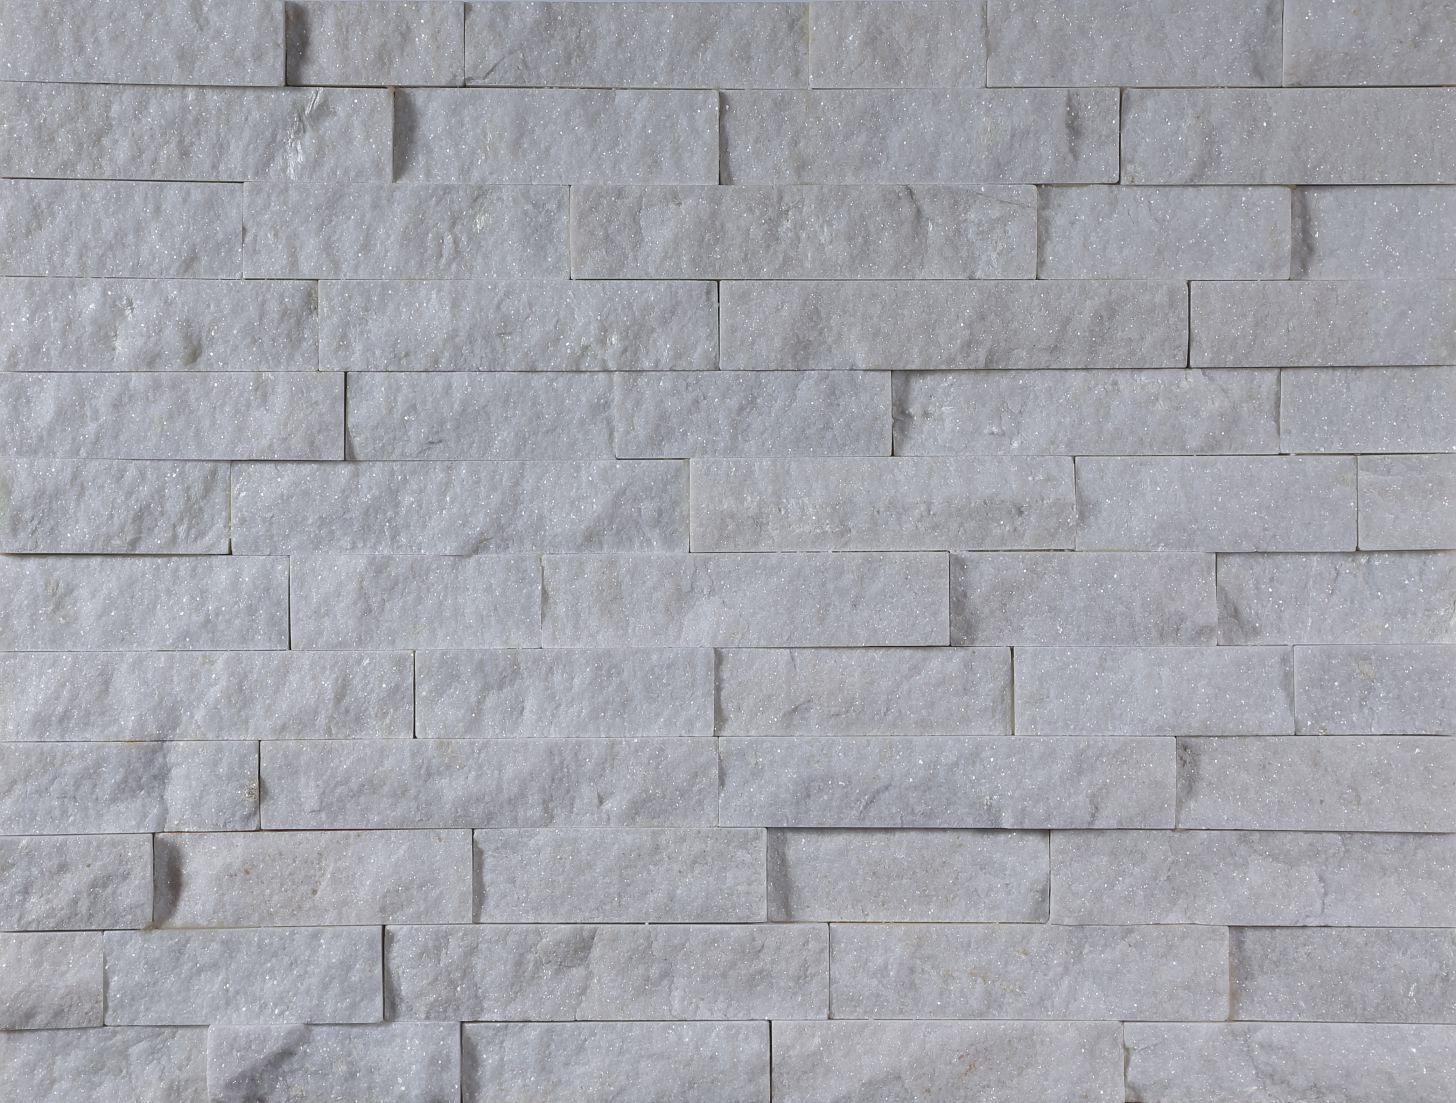 White quartz culture stone panel